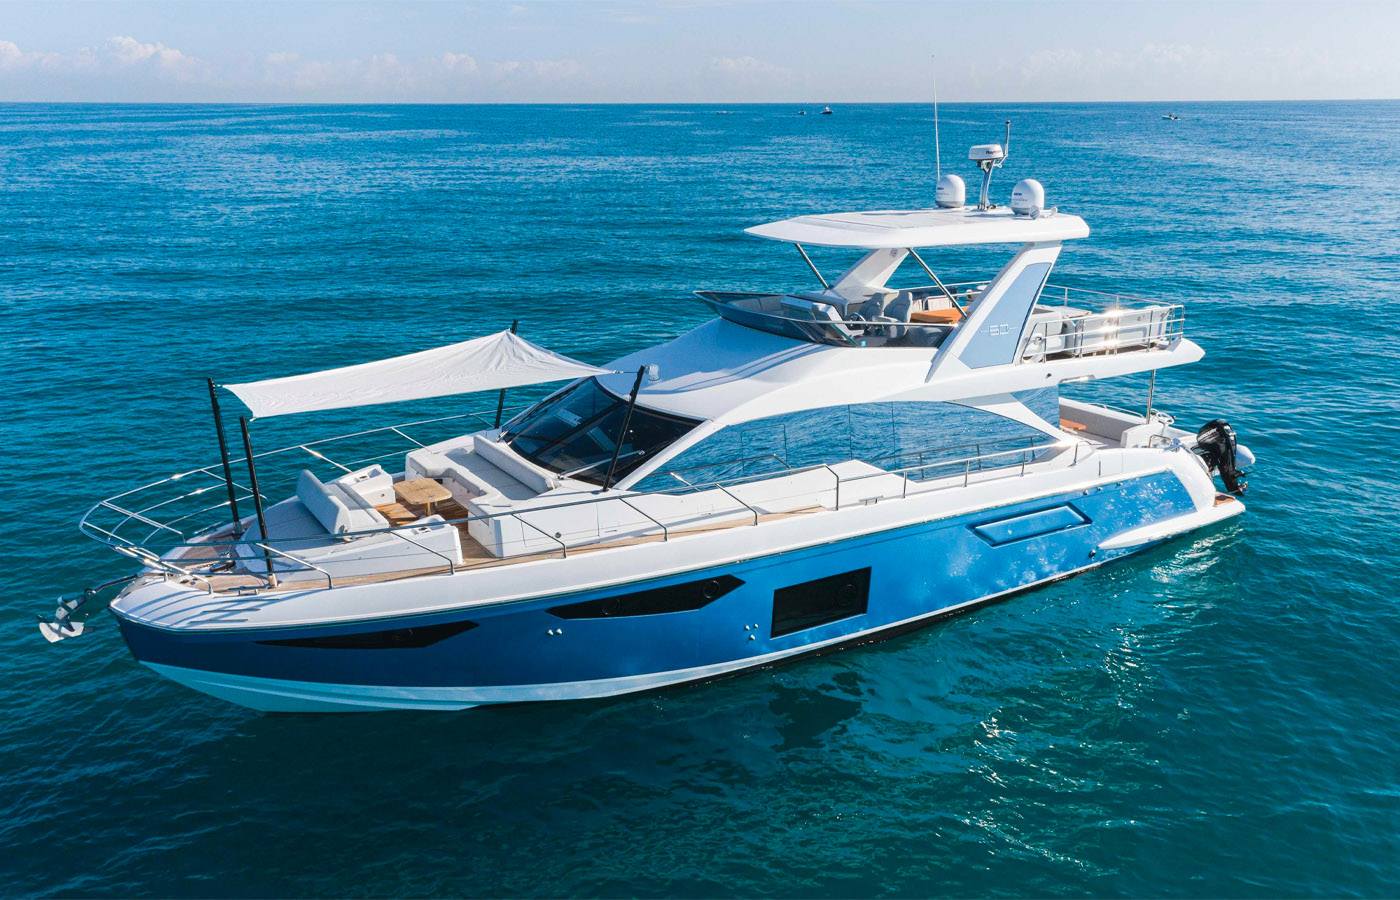 Azimut 60 Motor Yacht Highlight [Boat Review]